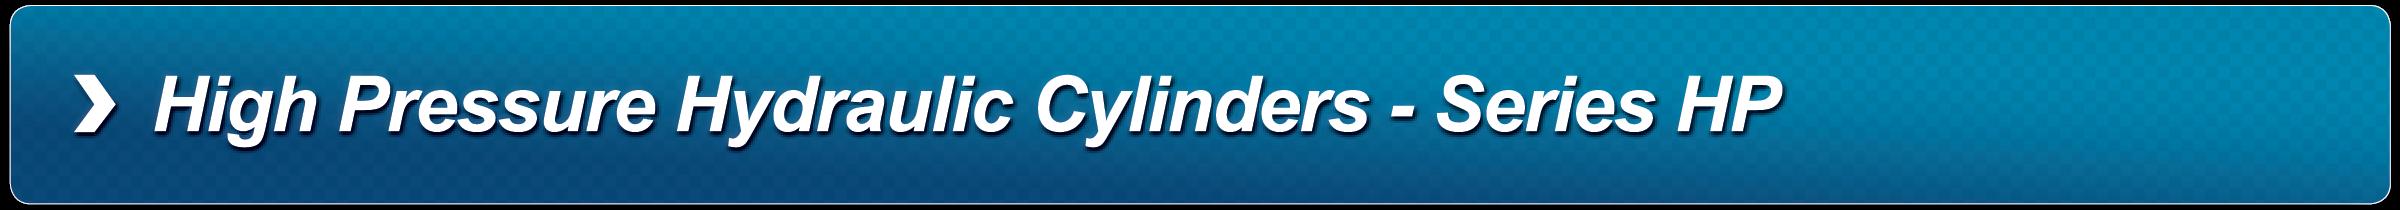 High Pressue Hyrdraulic Cylinders Series HP